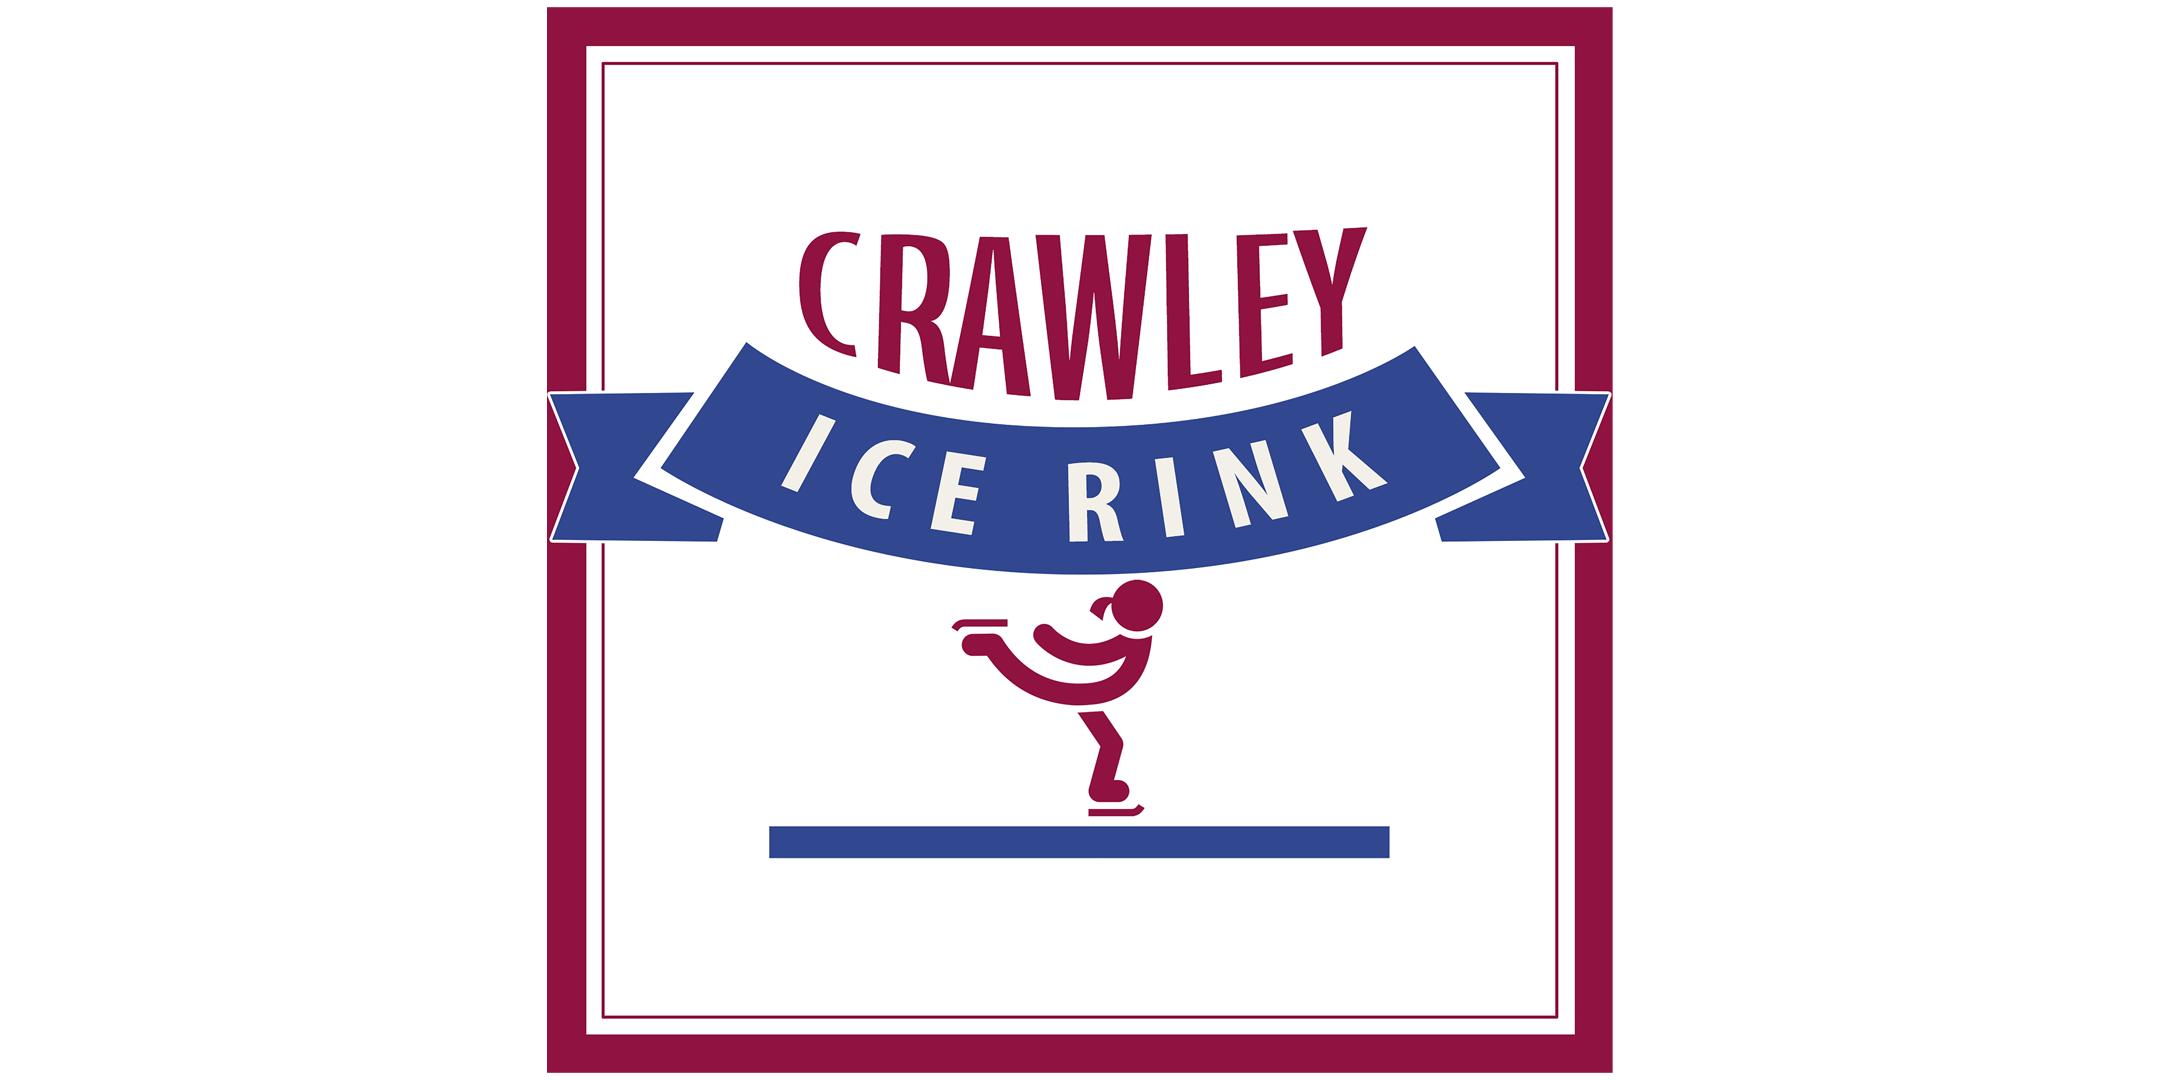 Crawley Ice Rink - 5th January (Off Peak)